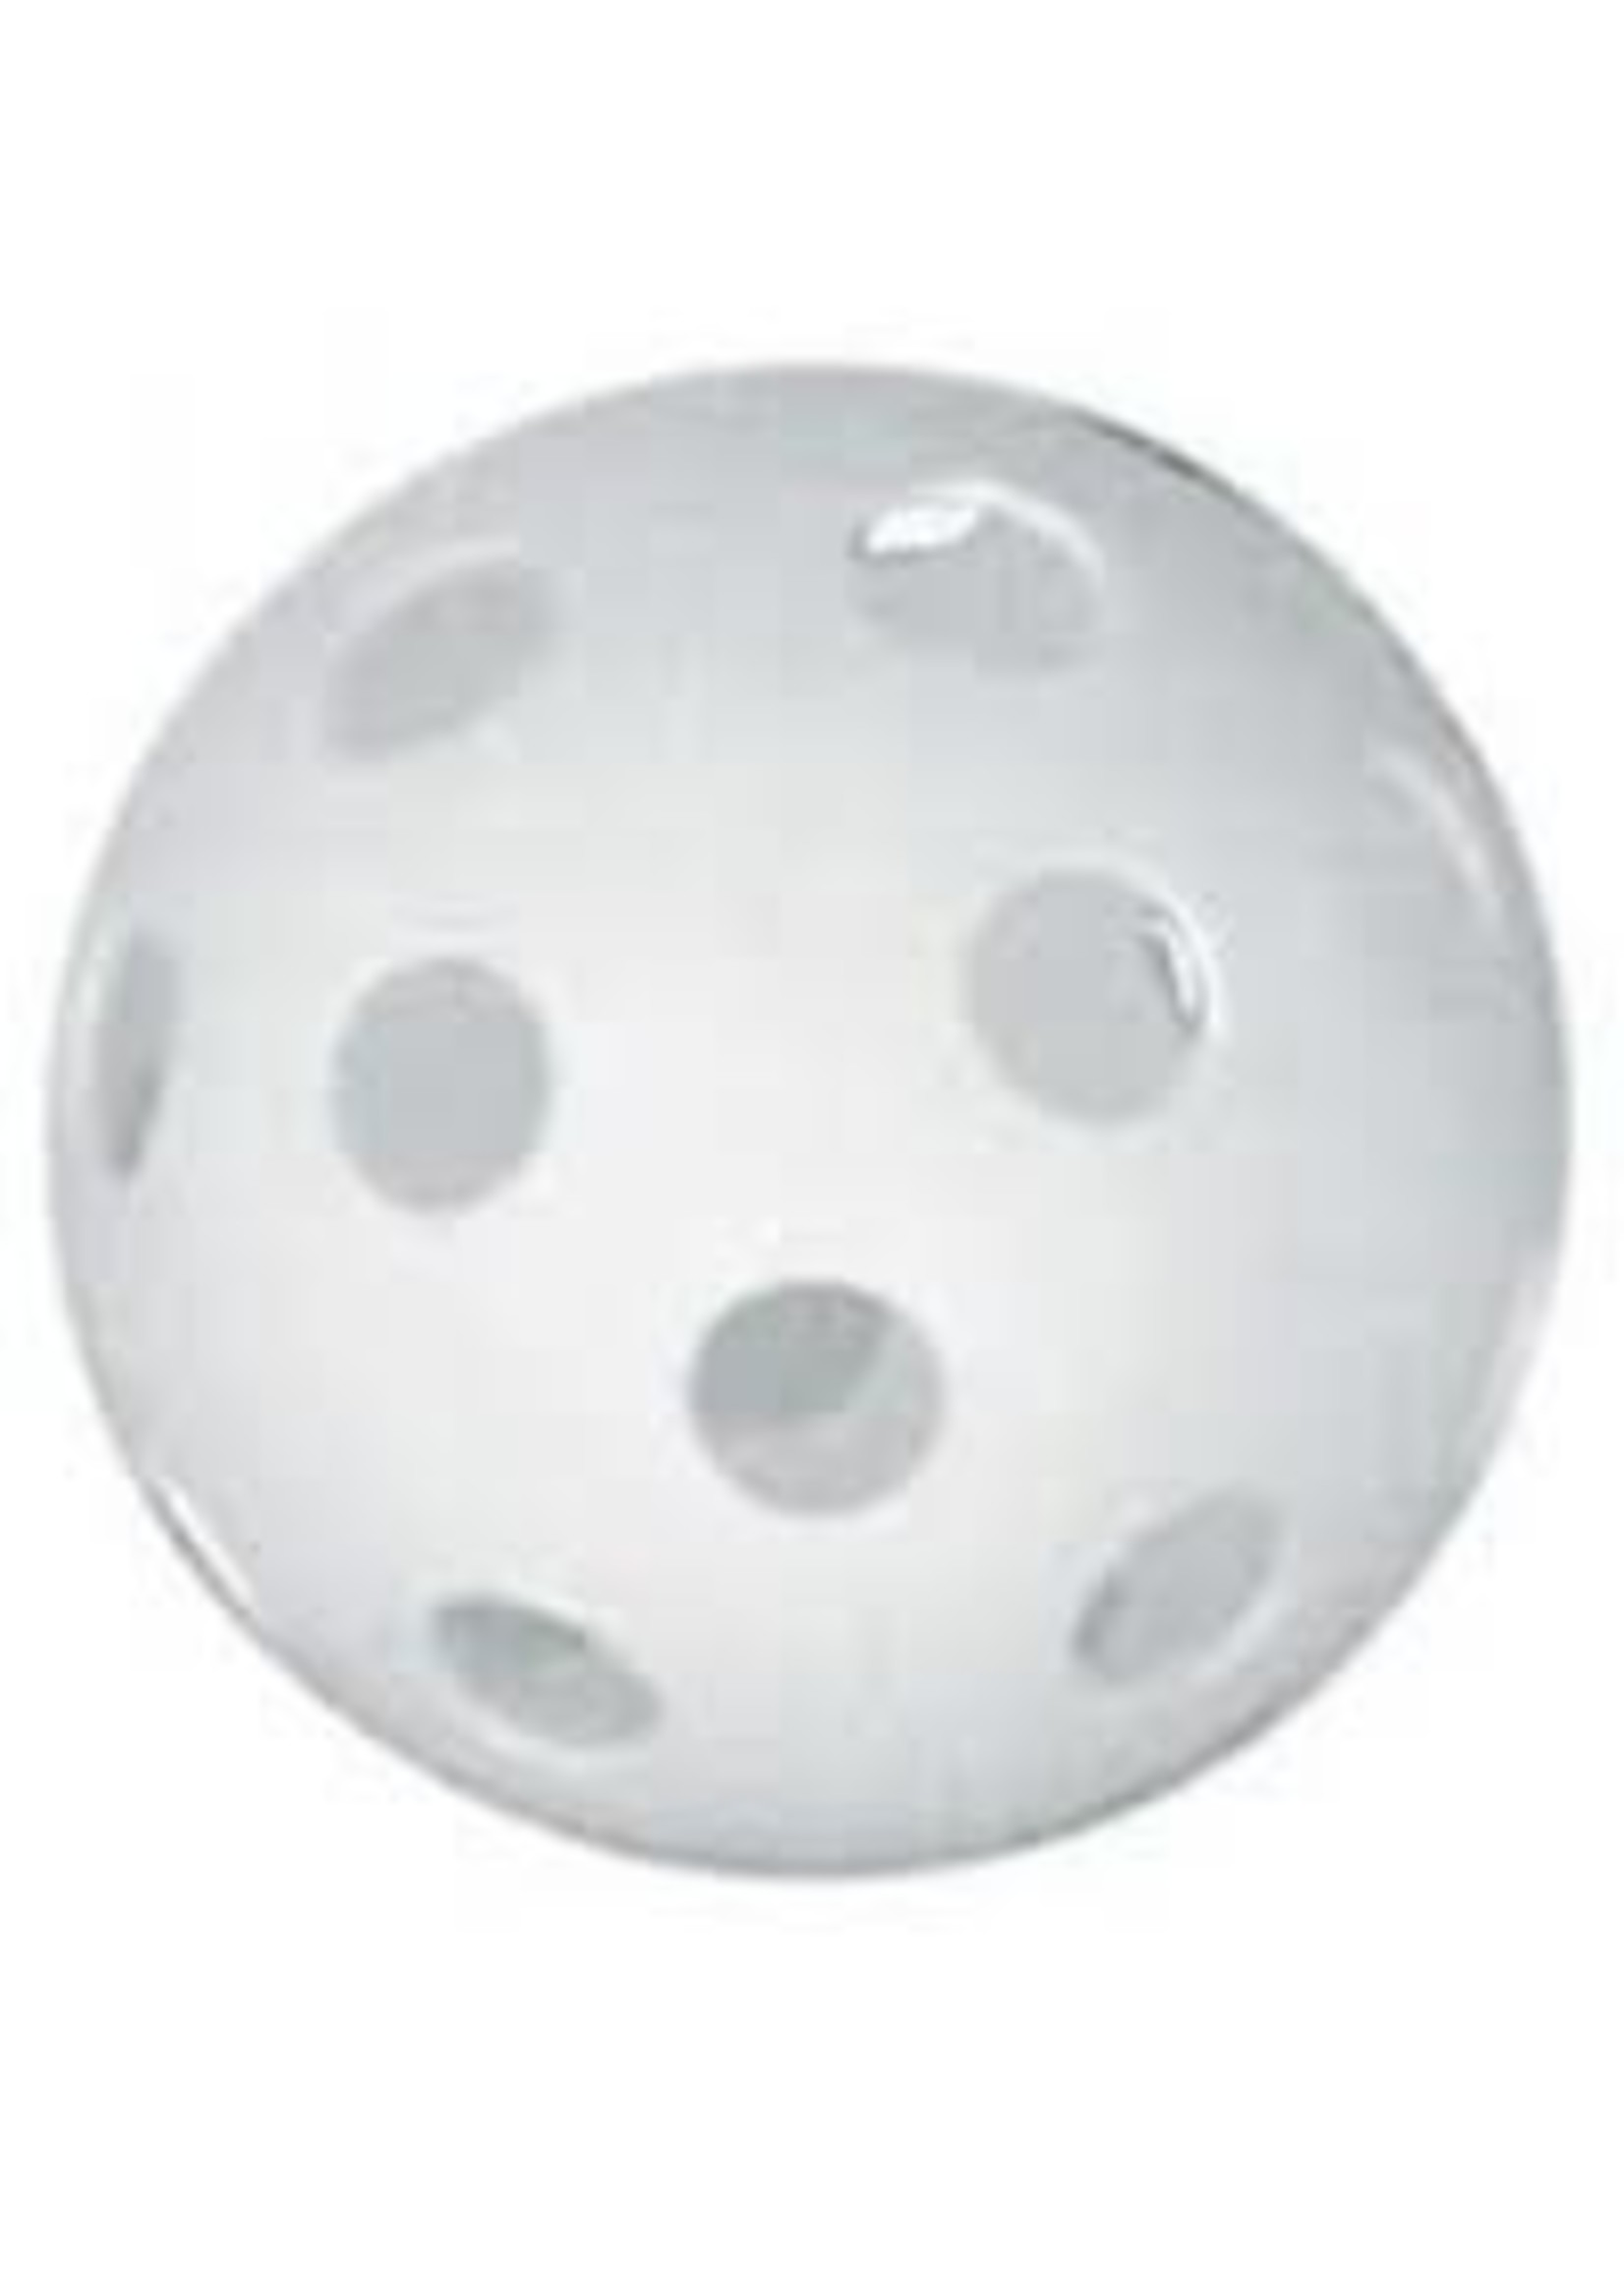 Easton Baseball (Canada) EASTON WHITE HOLED 9'' UNIT PRACTICE BALL